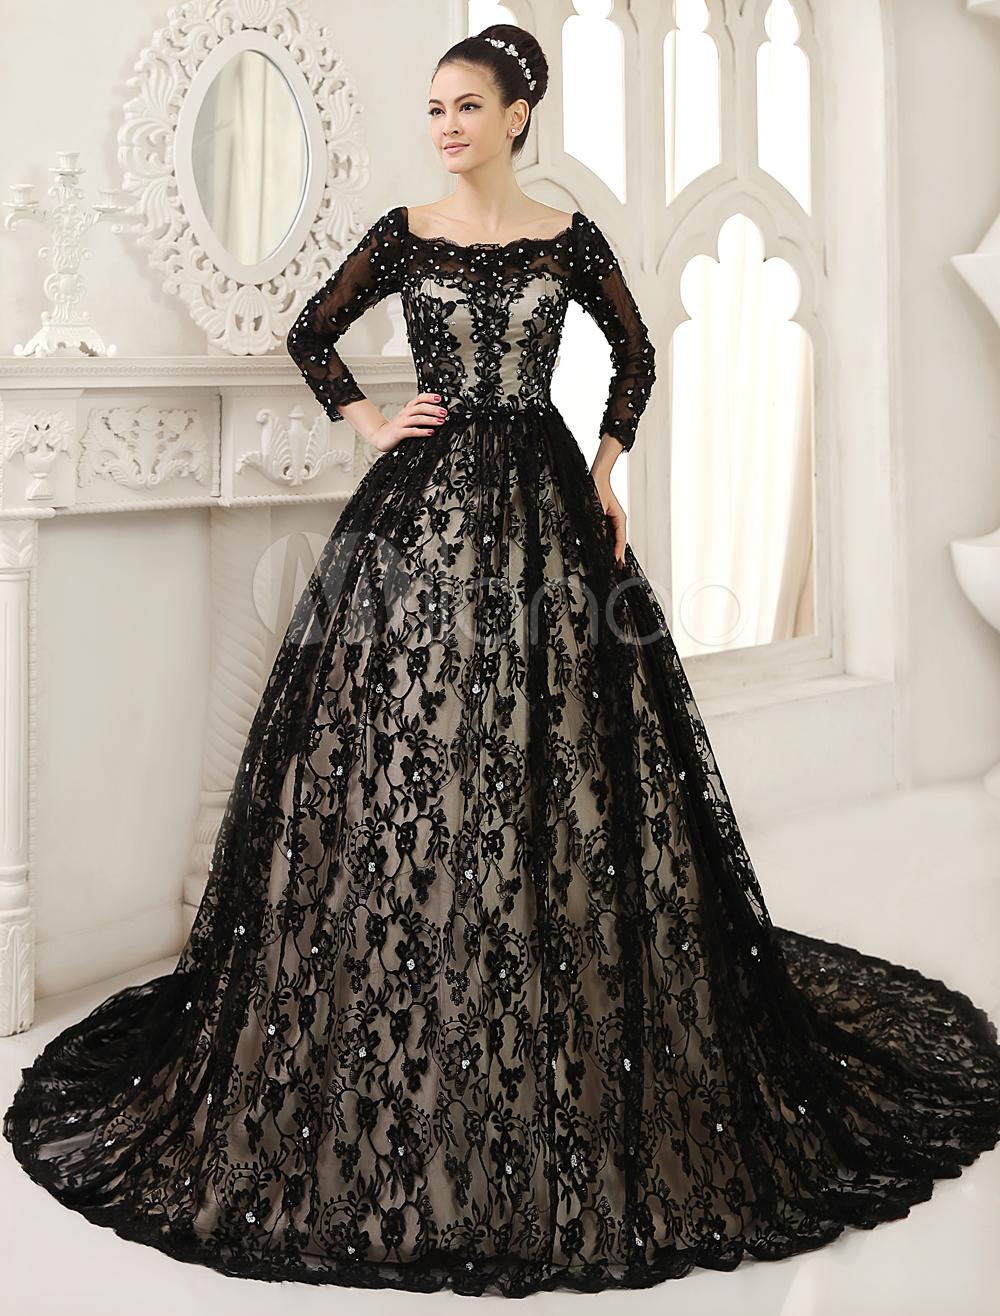 Black Wedding Dress A Line Scoop Neck Sequin Chapel Train Lace Wedding Gown Milanoo Gowns Colored Wedding Dresses Wedding Dresses [ 1316 x 1000 Pixel ]